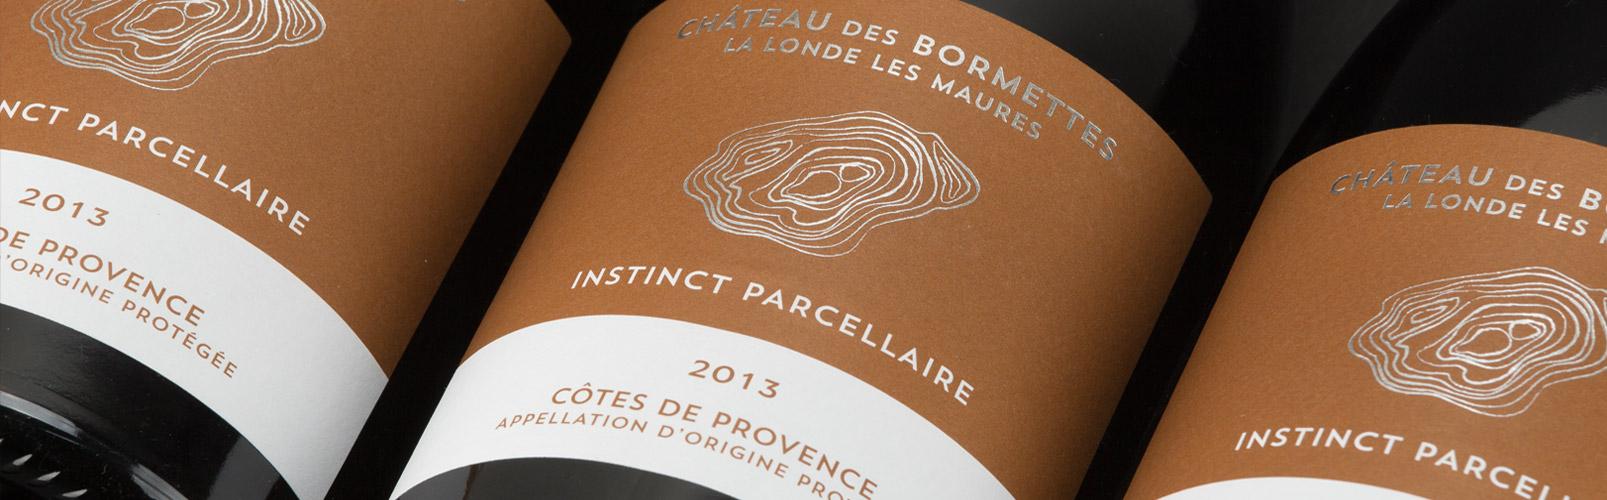 vin-chateau-bormettes-slider-12